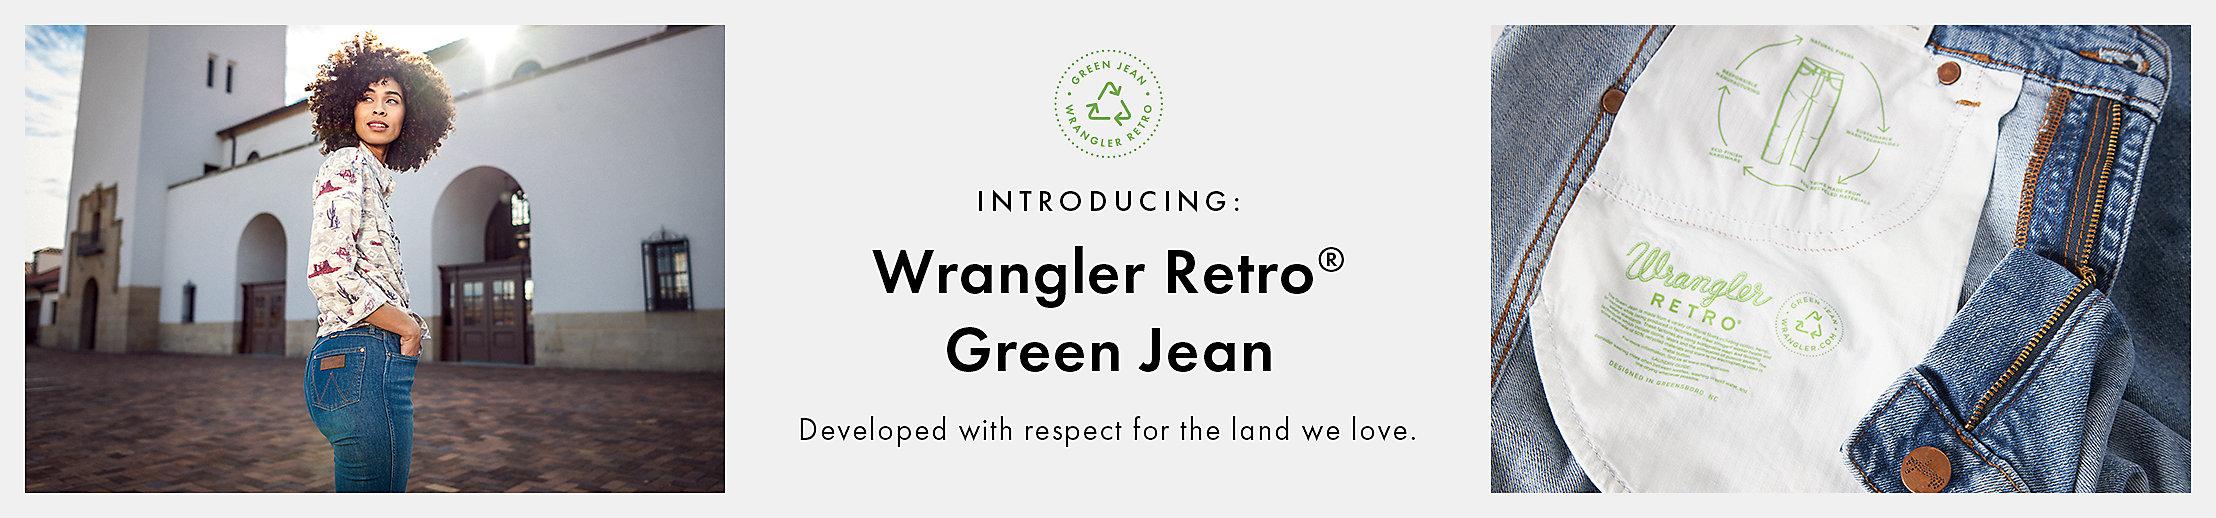 Wrangler Retro® Green Jean